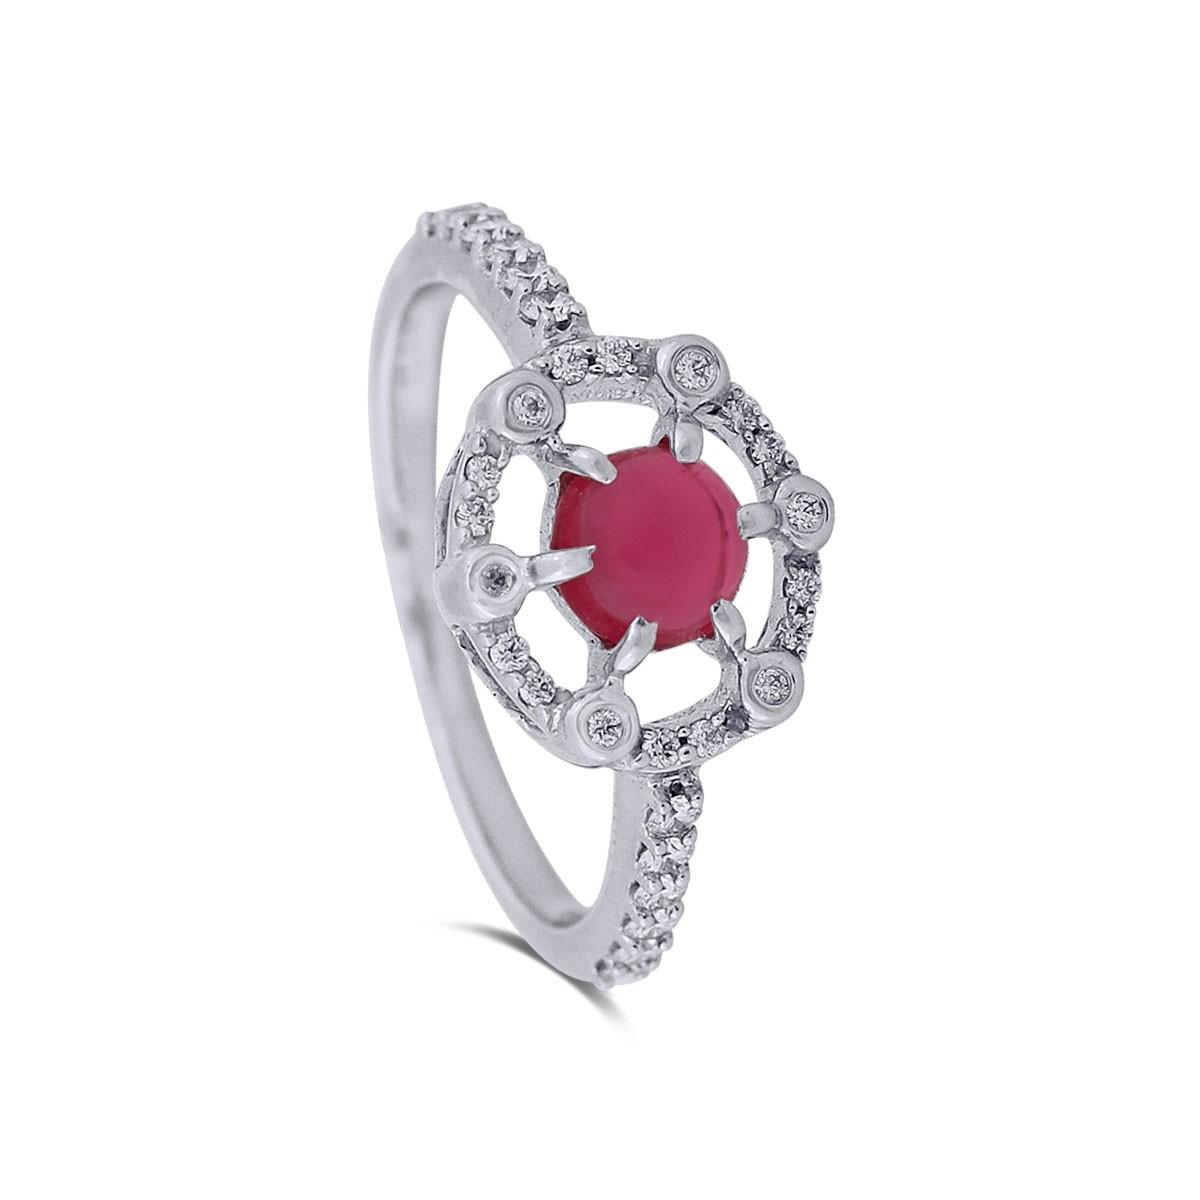 Sameera WhiteGold Diamond Ring